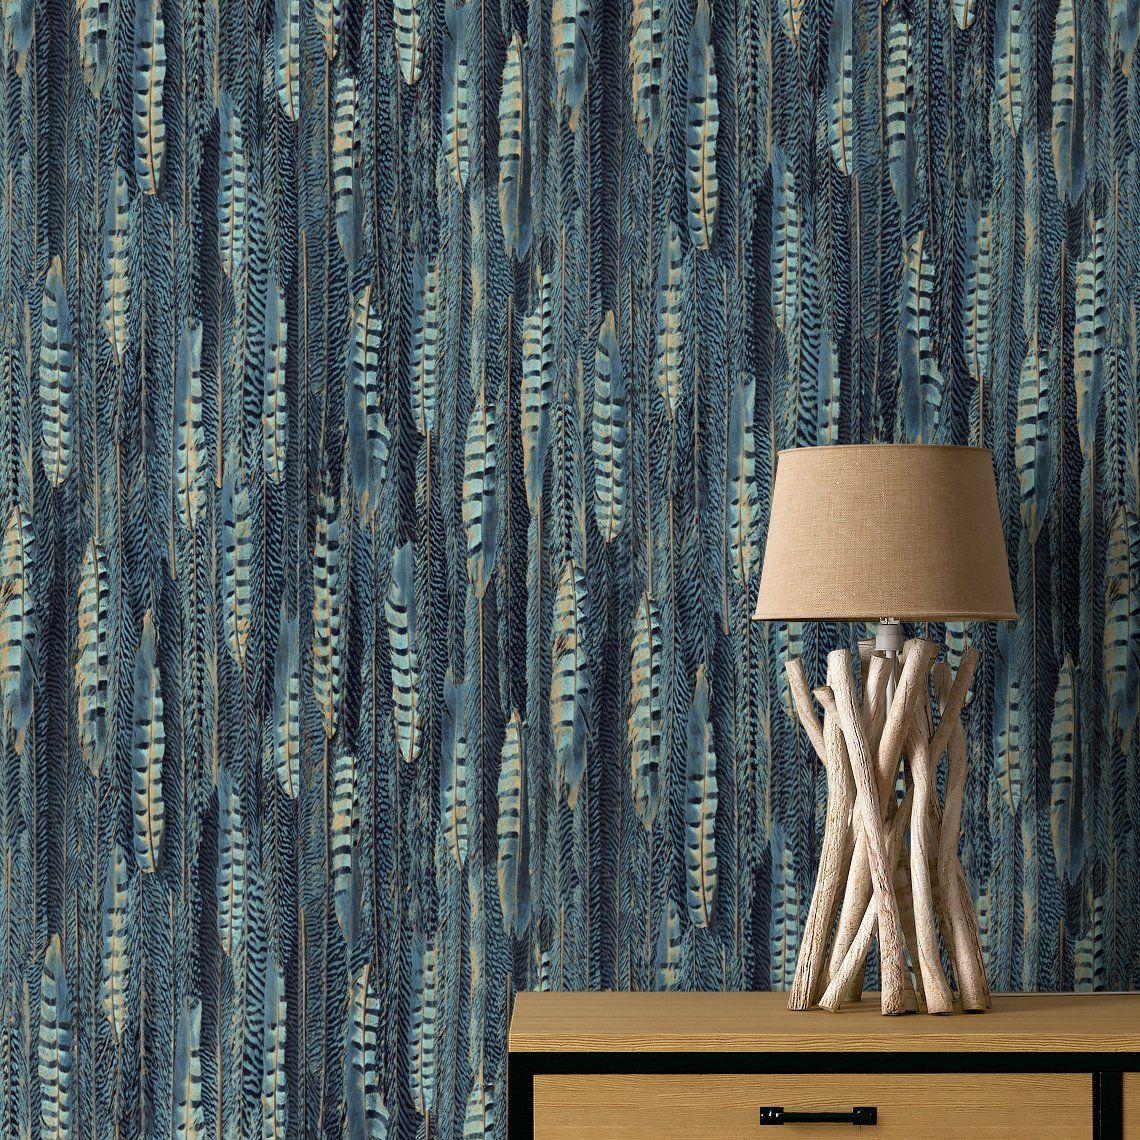 papier peint theodore vinyle sur intiss imprim plumes bleu vinyles plumes et papier peint. Black Bedroom Furniture Sets. Home Design Ideas